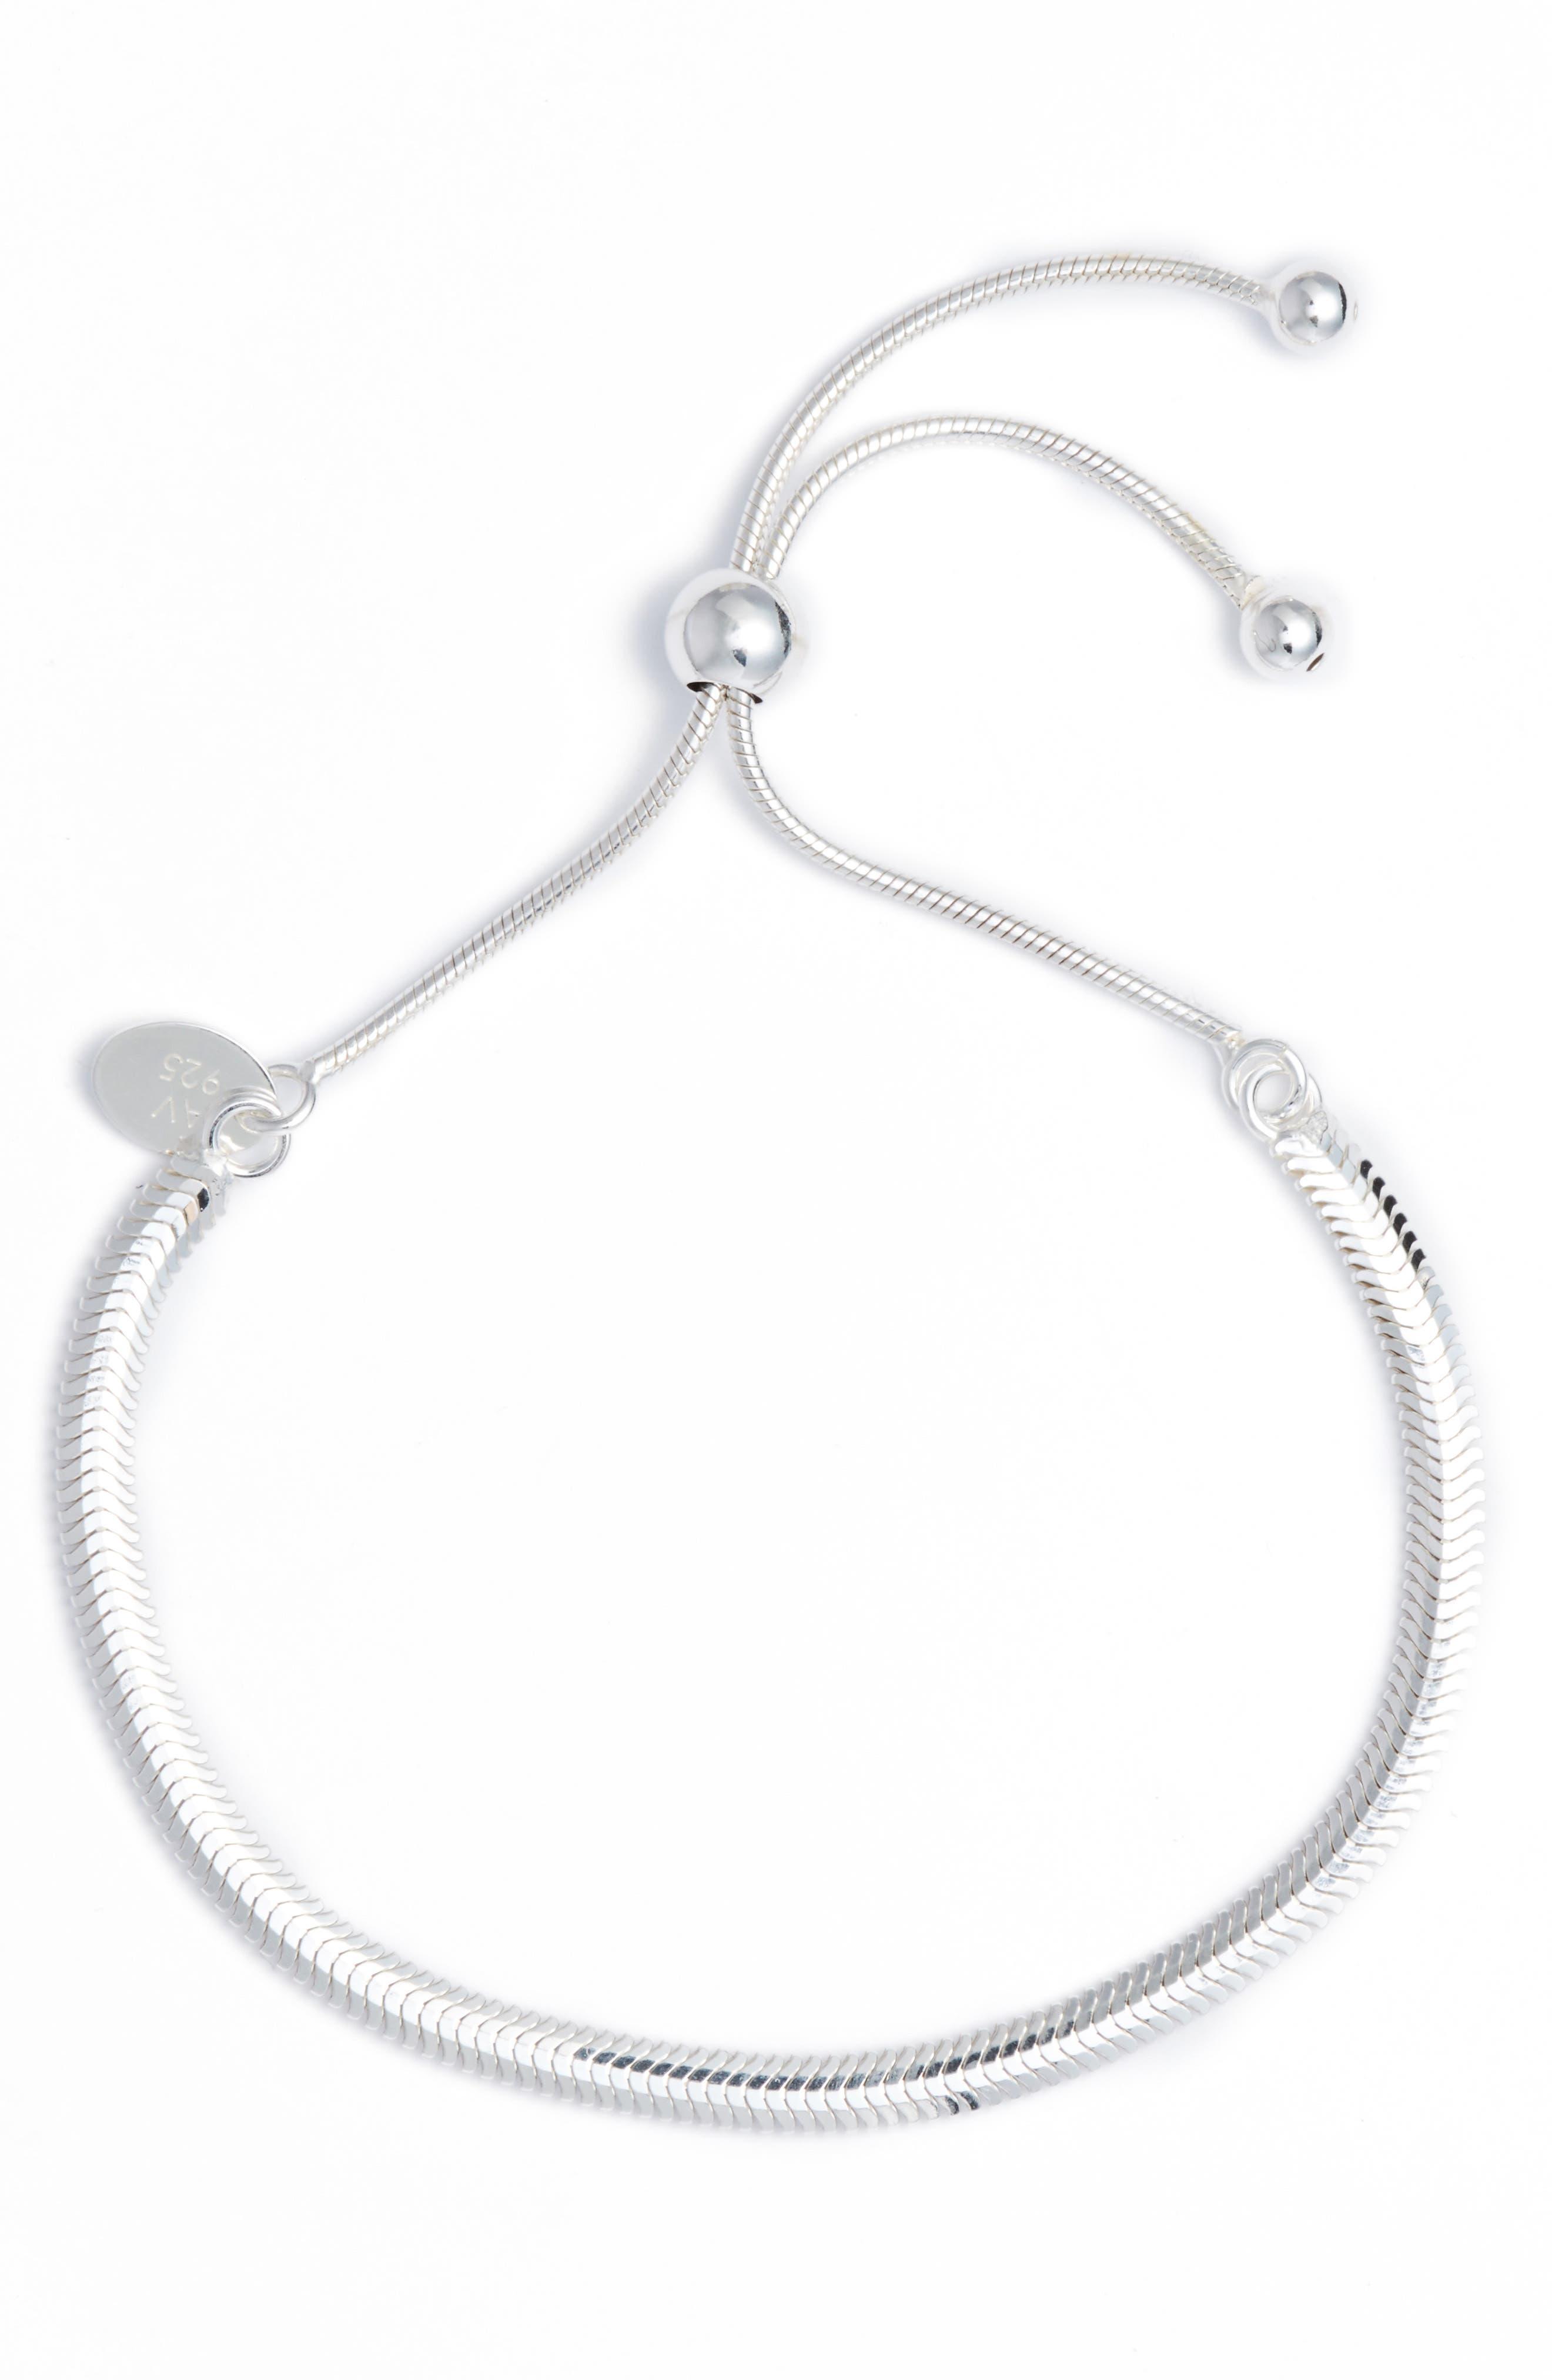 Herringbone Adjustable Bracelet,                             Main thumbnail 1, color,                             040